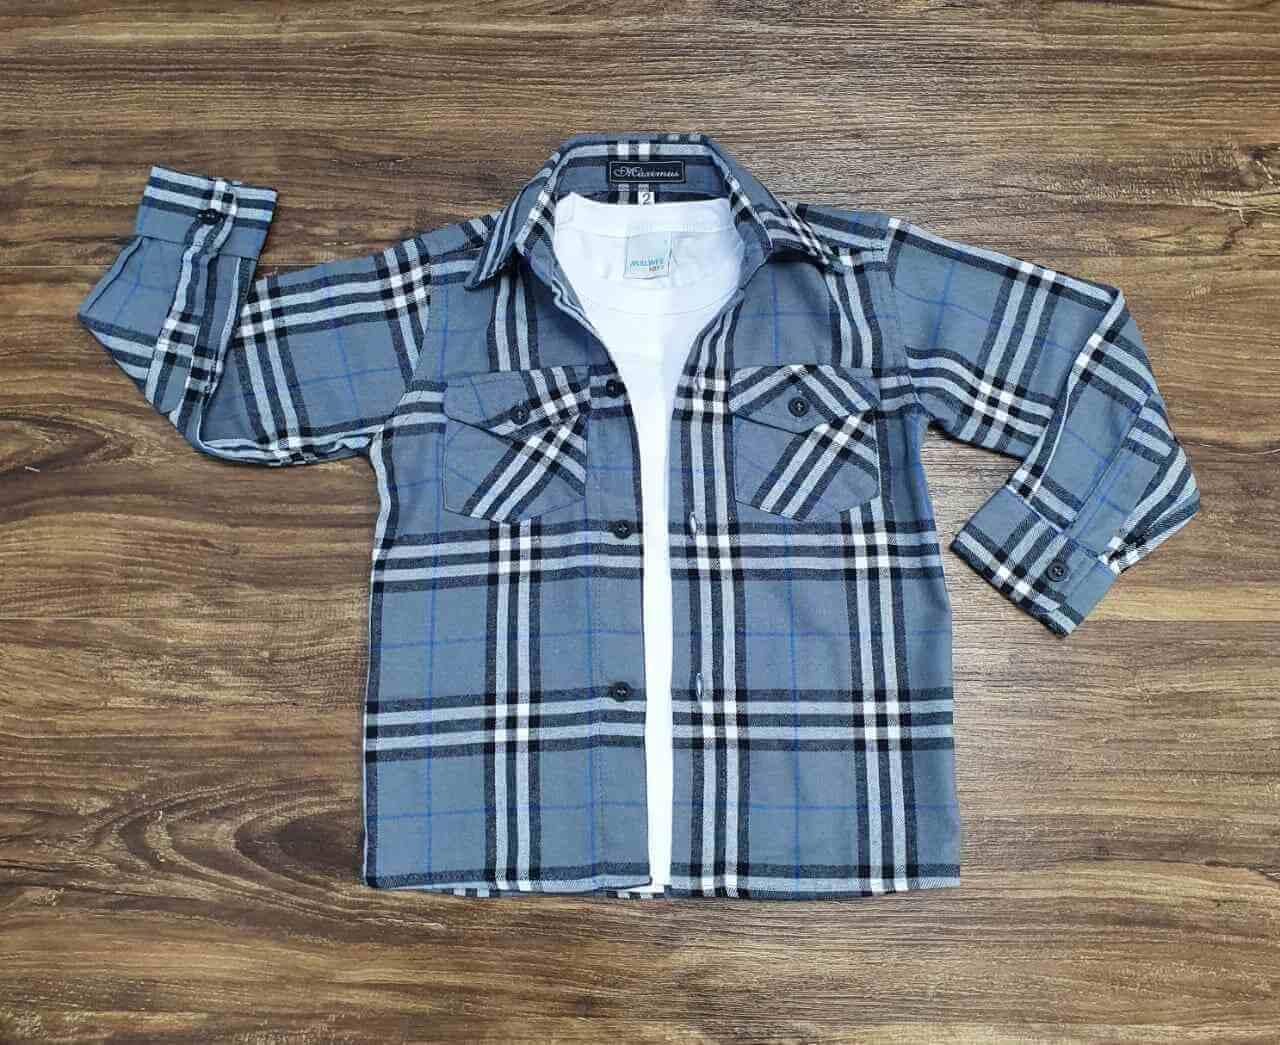 Camisa Xadrez com Camiseta Infantil